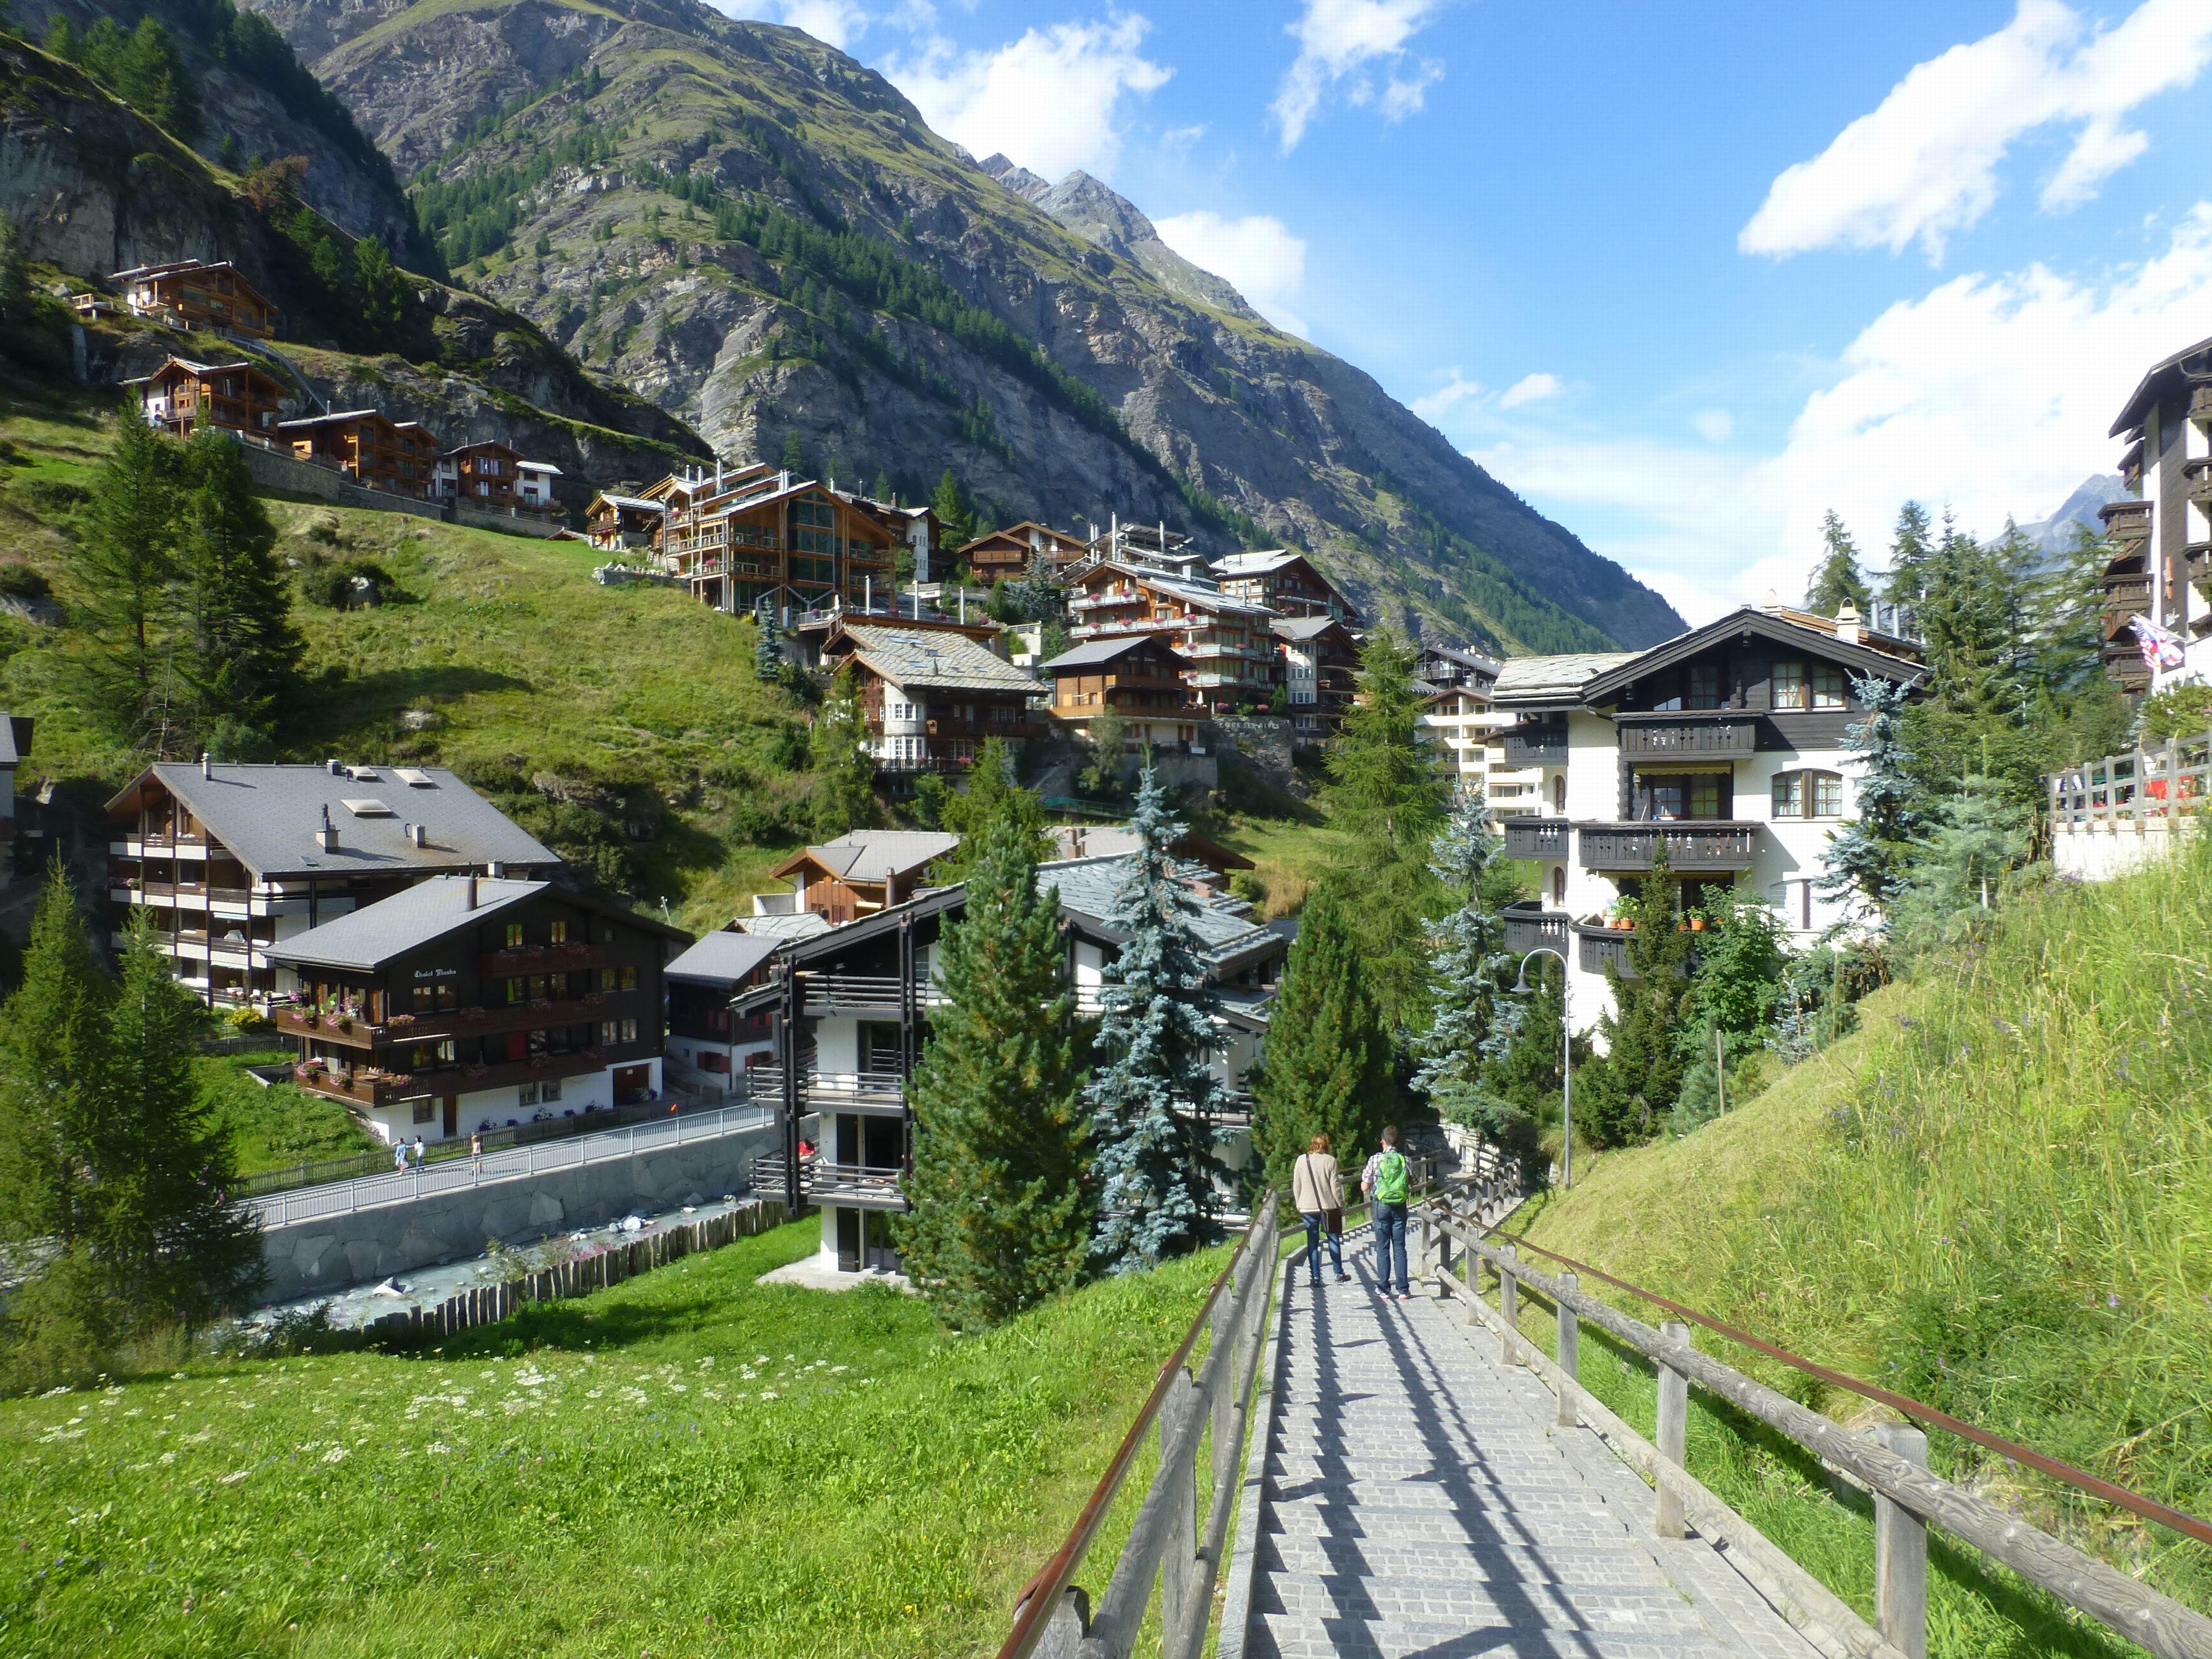 Zermatt02.jpg